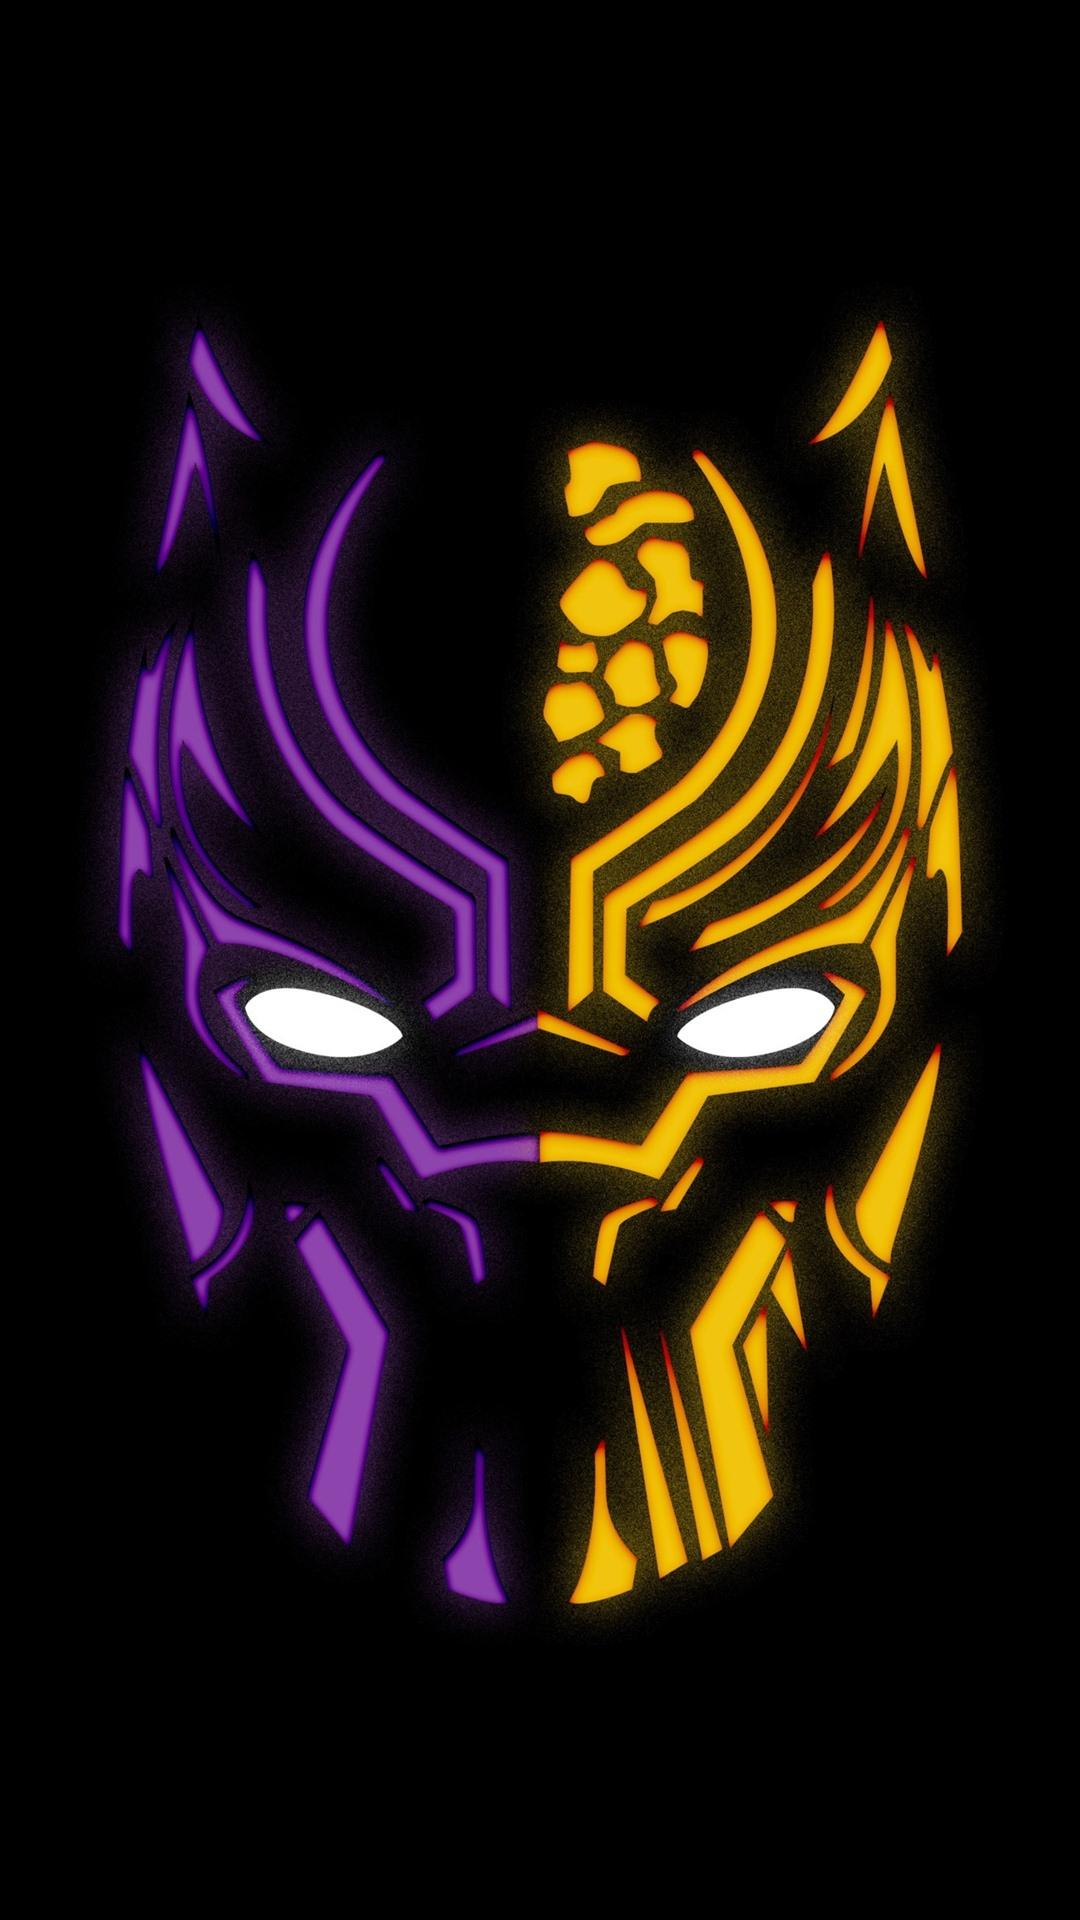 Black Panther Logo Black Background 1080x1920 Iphone 8 7 6